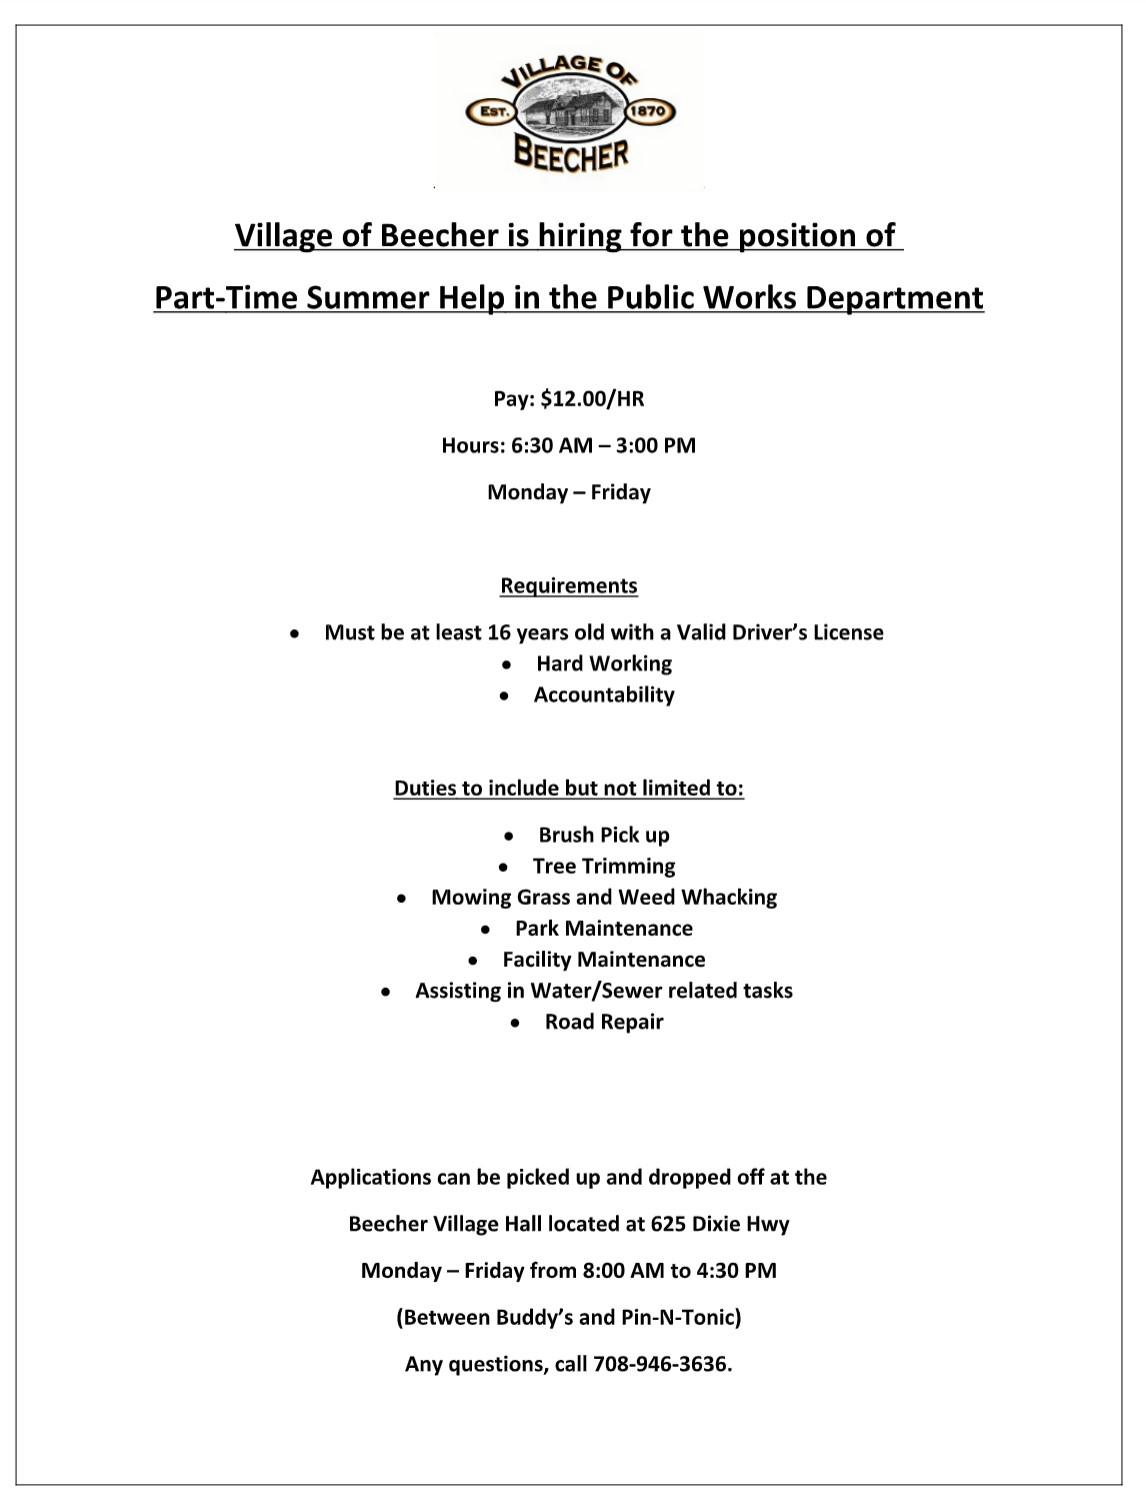 Village of Beecher Hiring